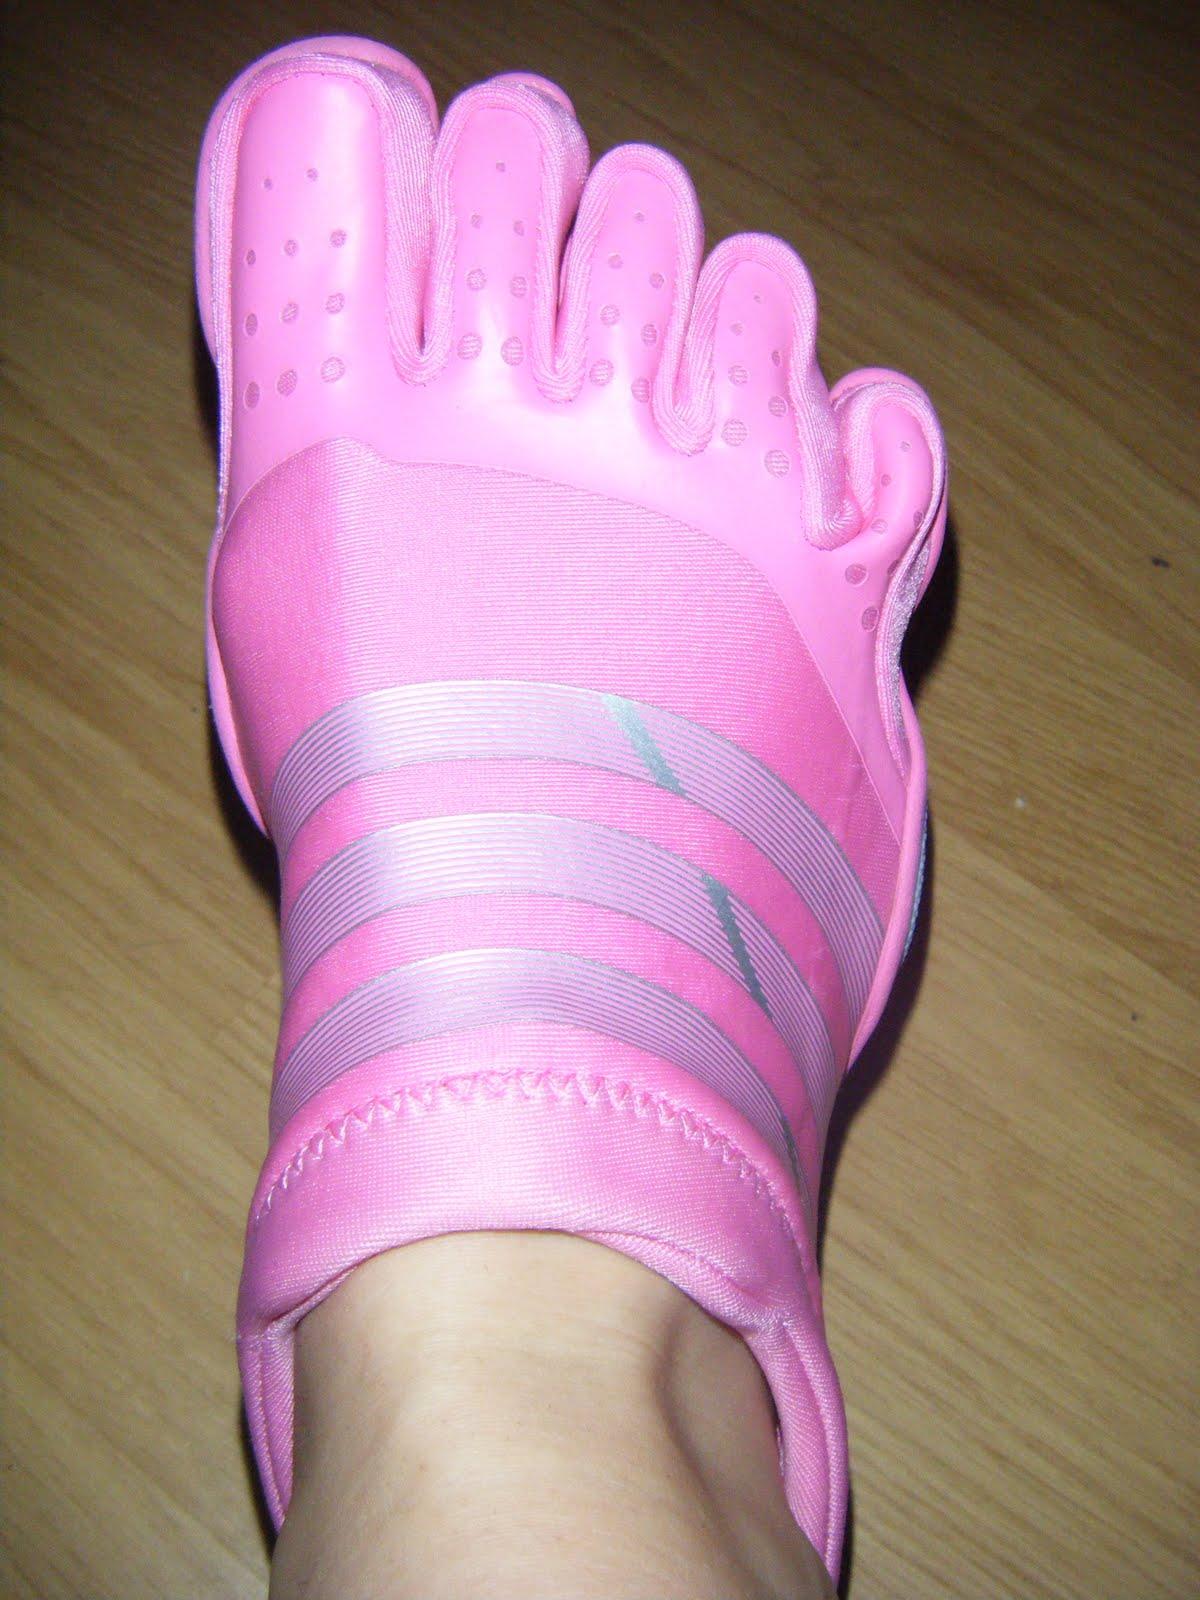 Chaussure 54qd5xwsz Doigt De A Adidas Pied Uqx5nRPO